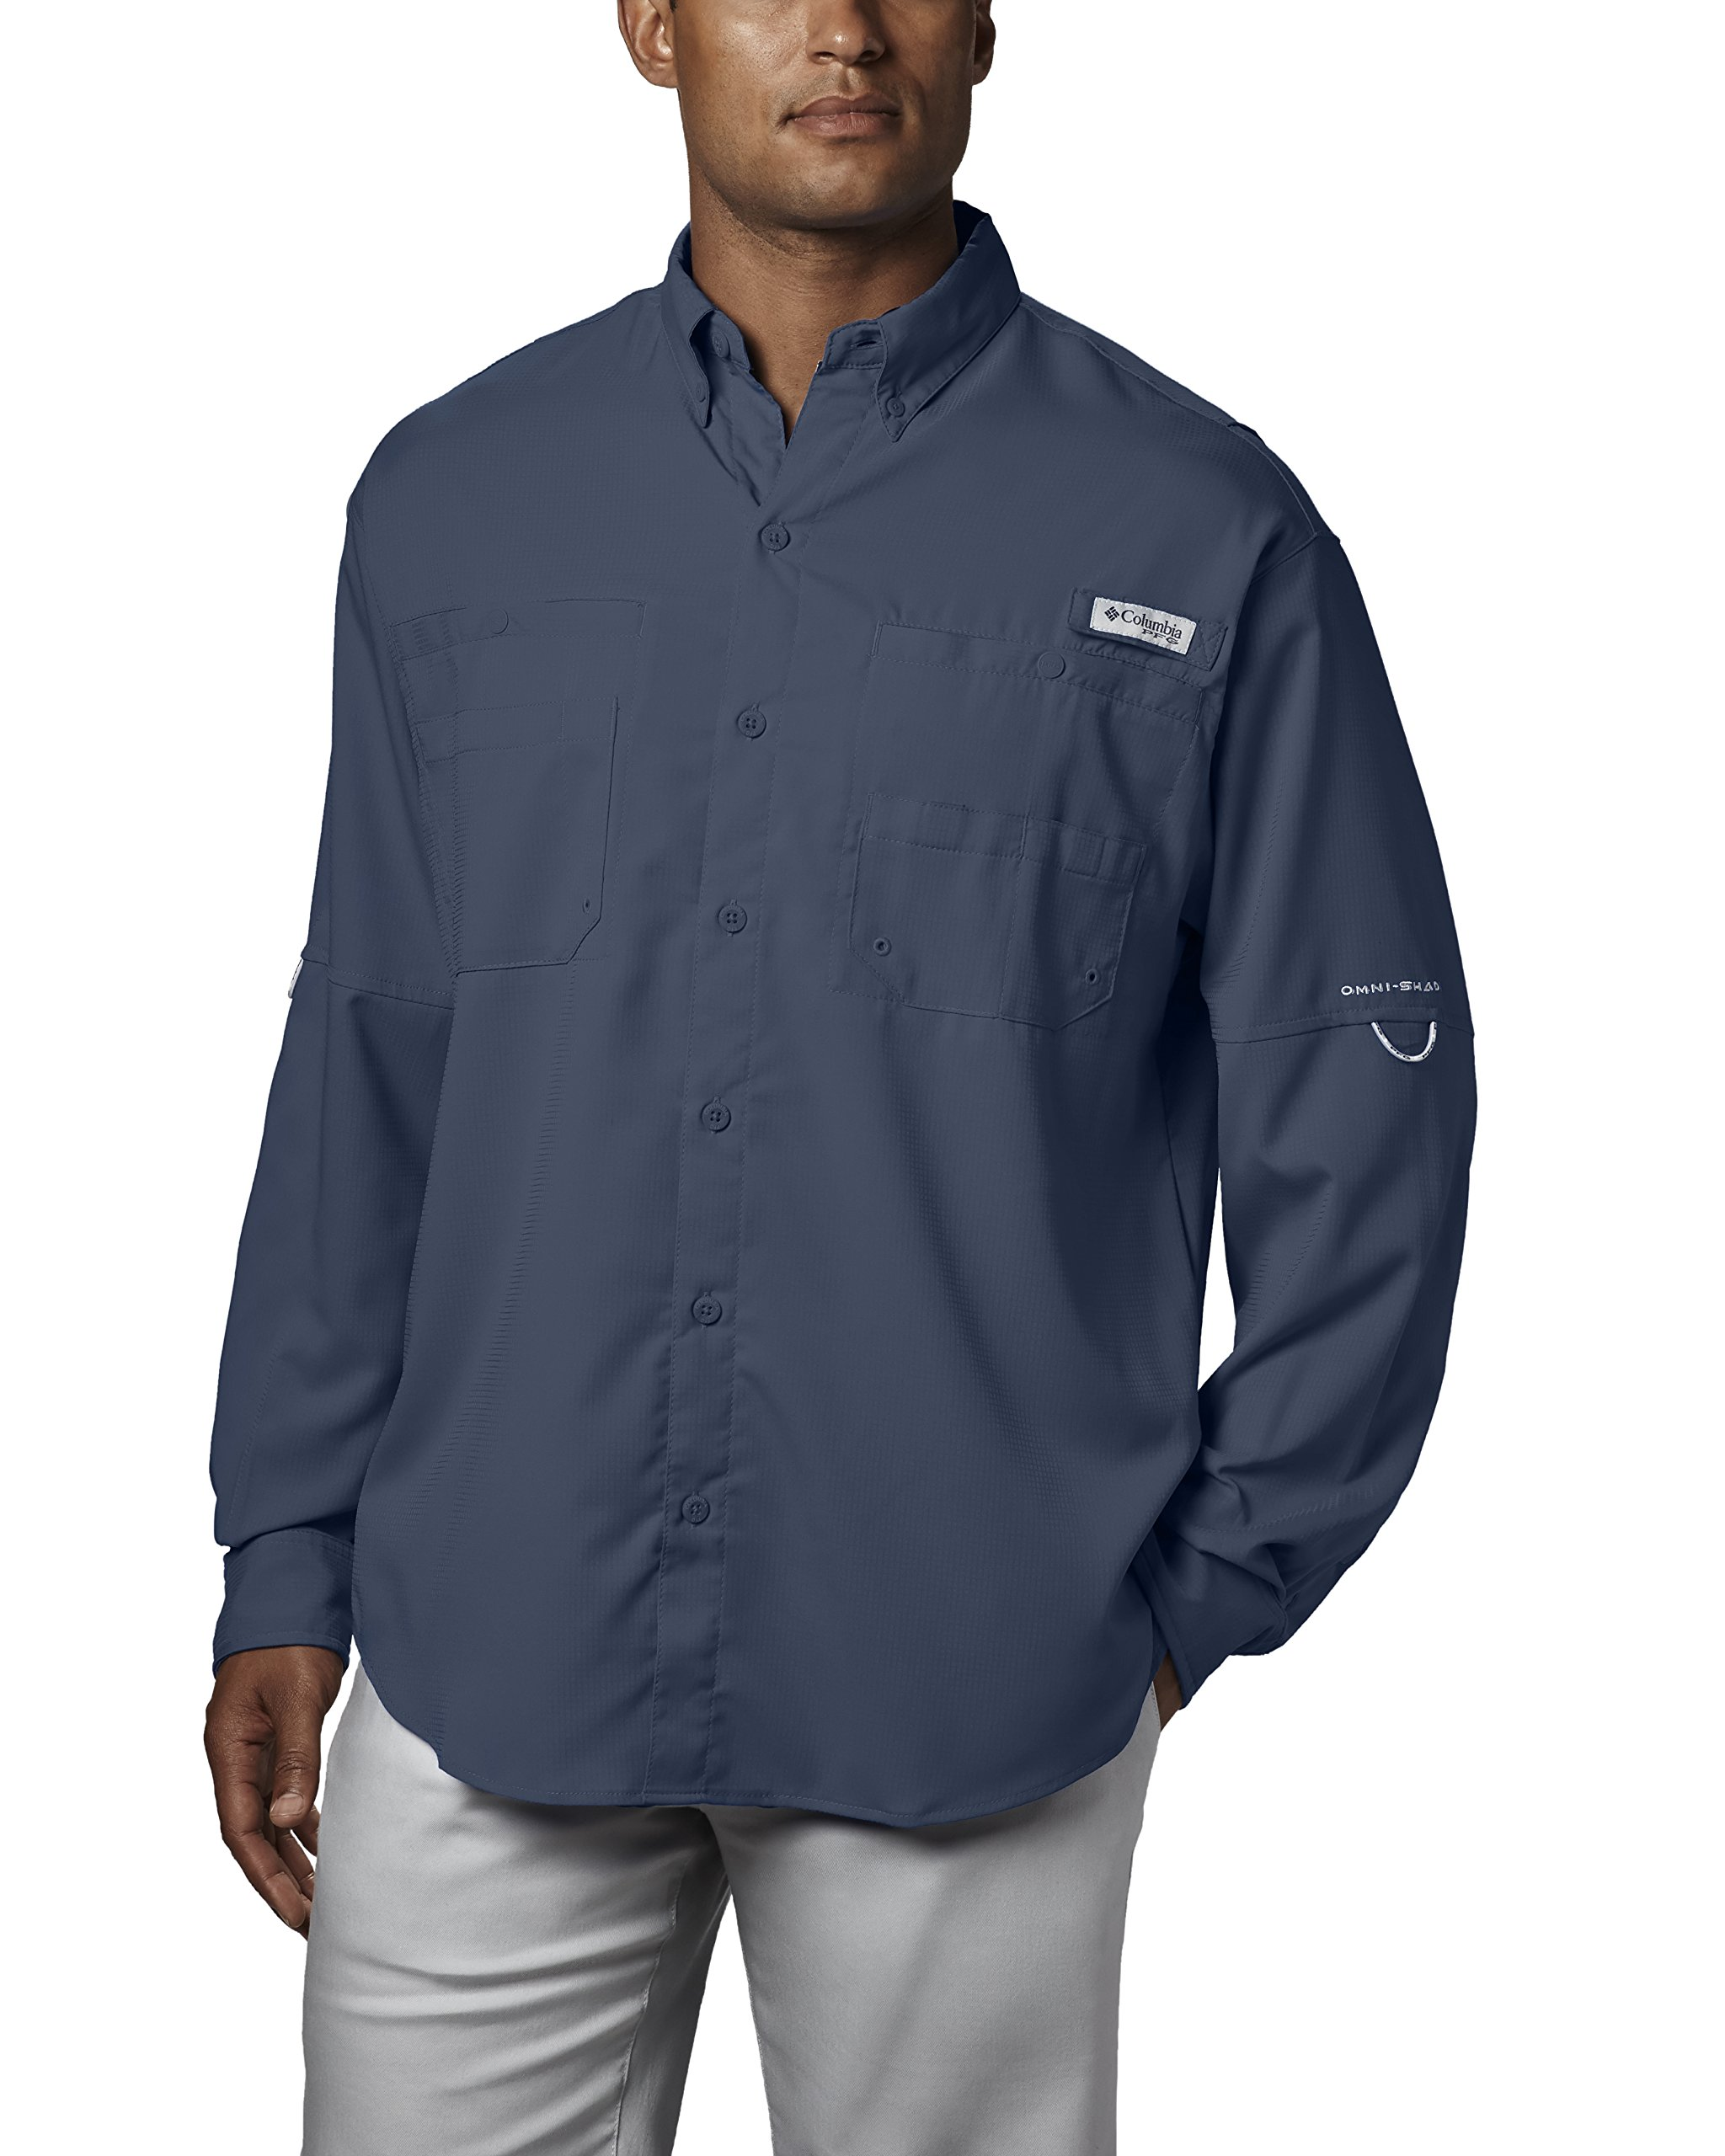 Columbia Men's Plus Tamiami II Long Sleeve Shirt, Dark Mountain - X-Small